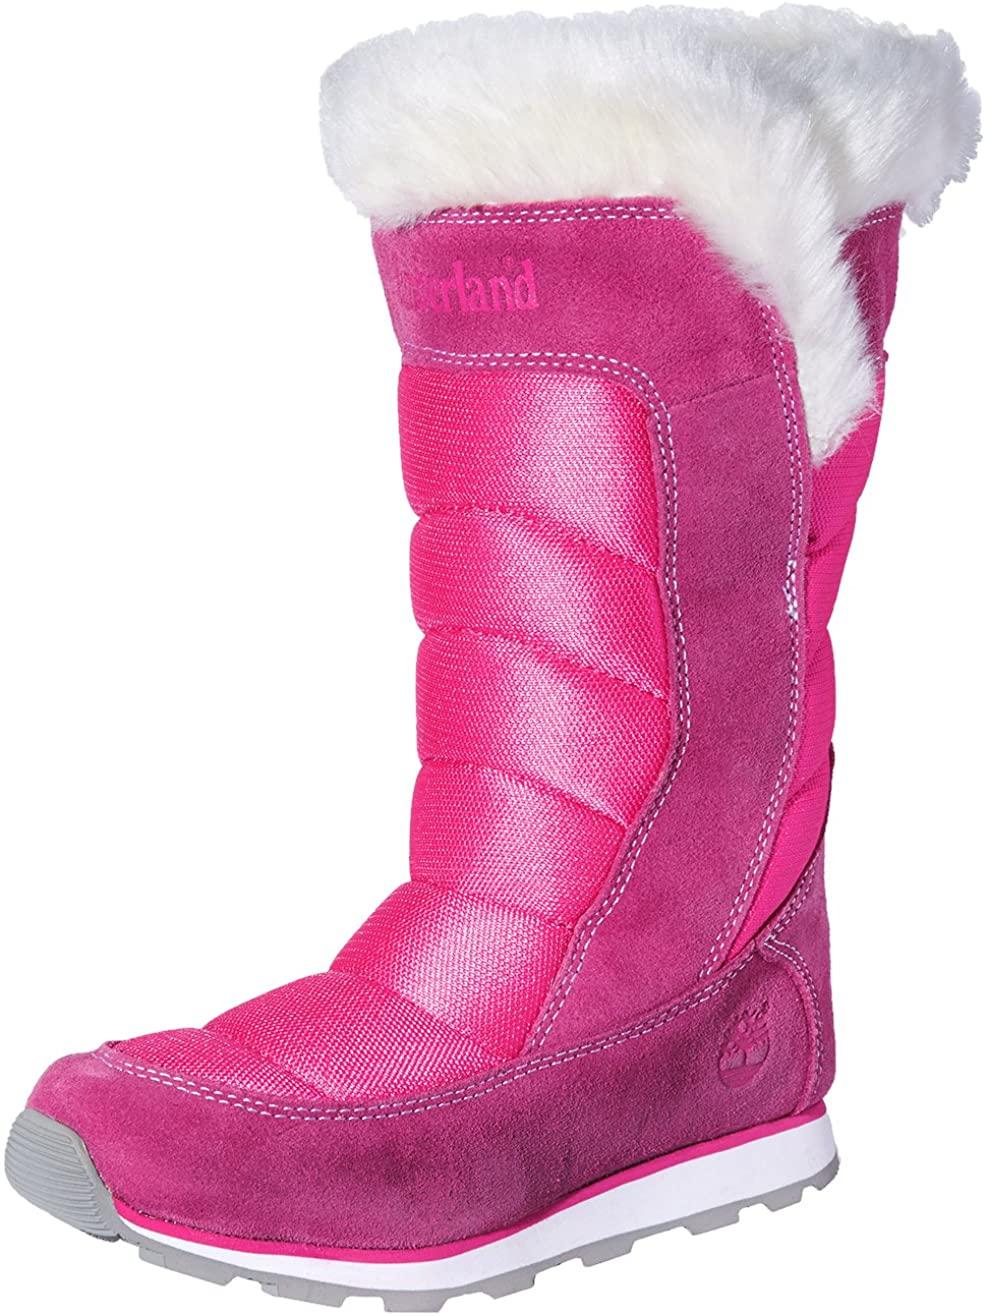 Timberland Winter Carnival Tall Boot (Toddler/Little Kid/Big Kid)